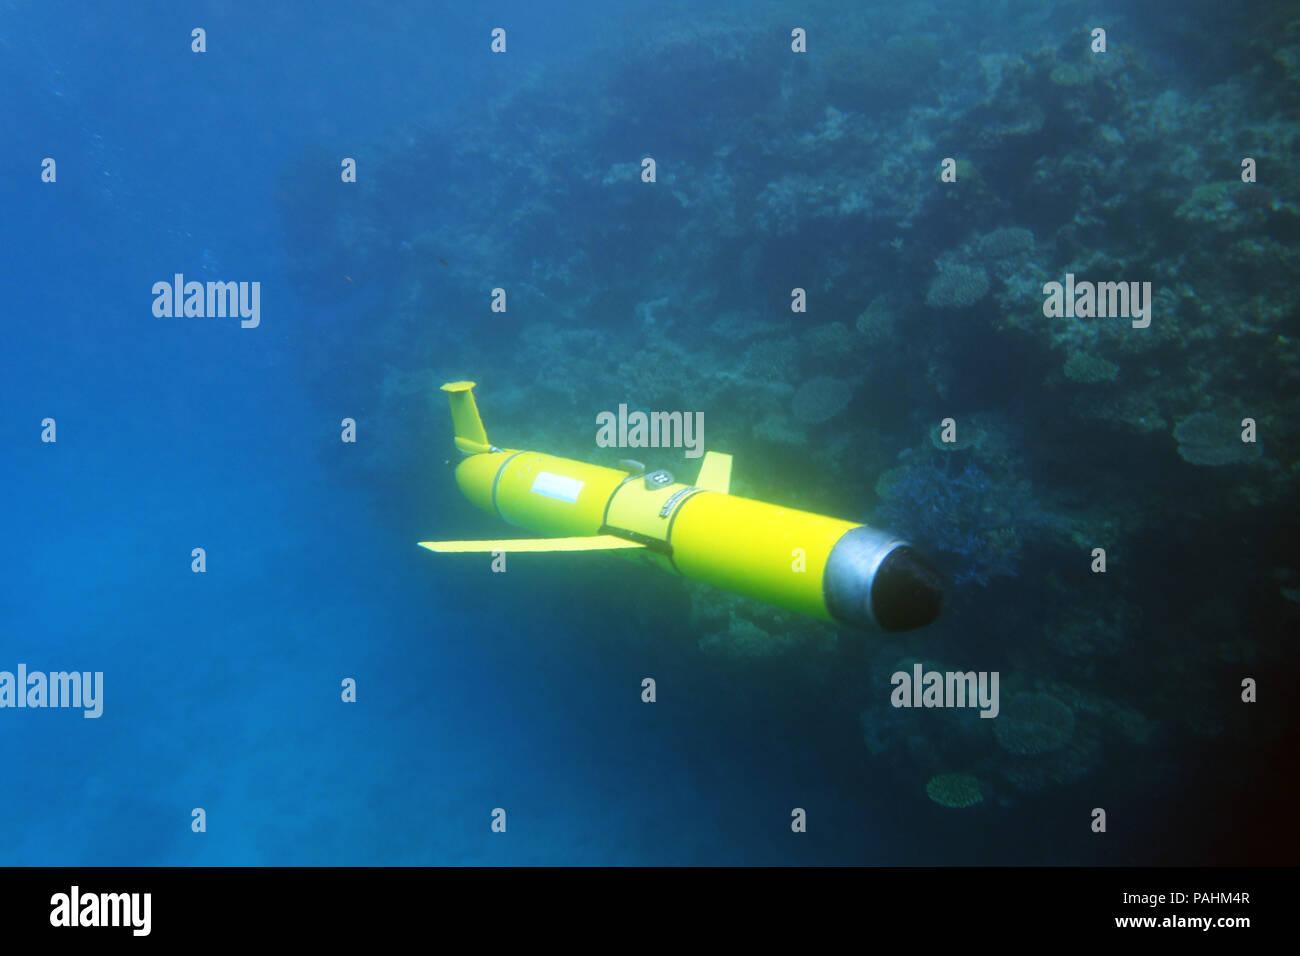 Slocum ocean glider (autonomous underwater oceanographic instrument) passing reef redge, Great Barrier Reef, Queensland, Australia. No PR Stock Photo